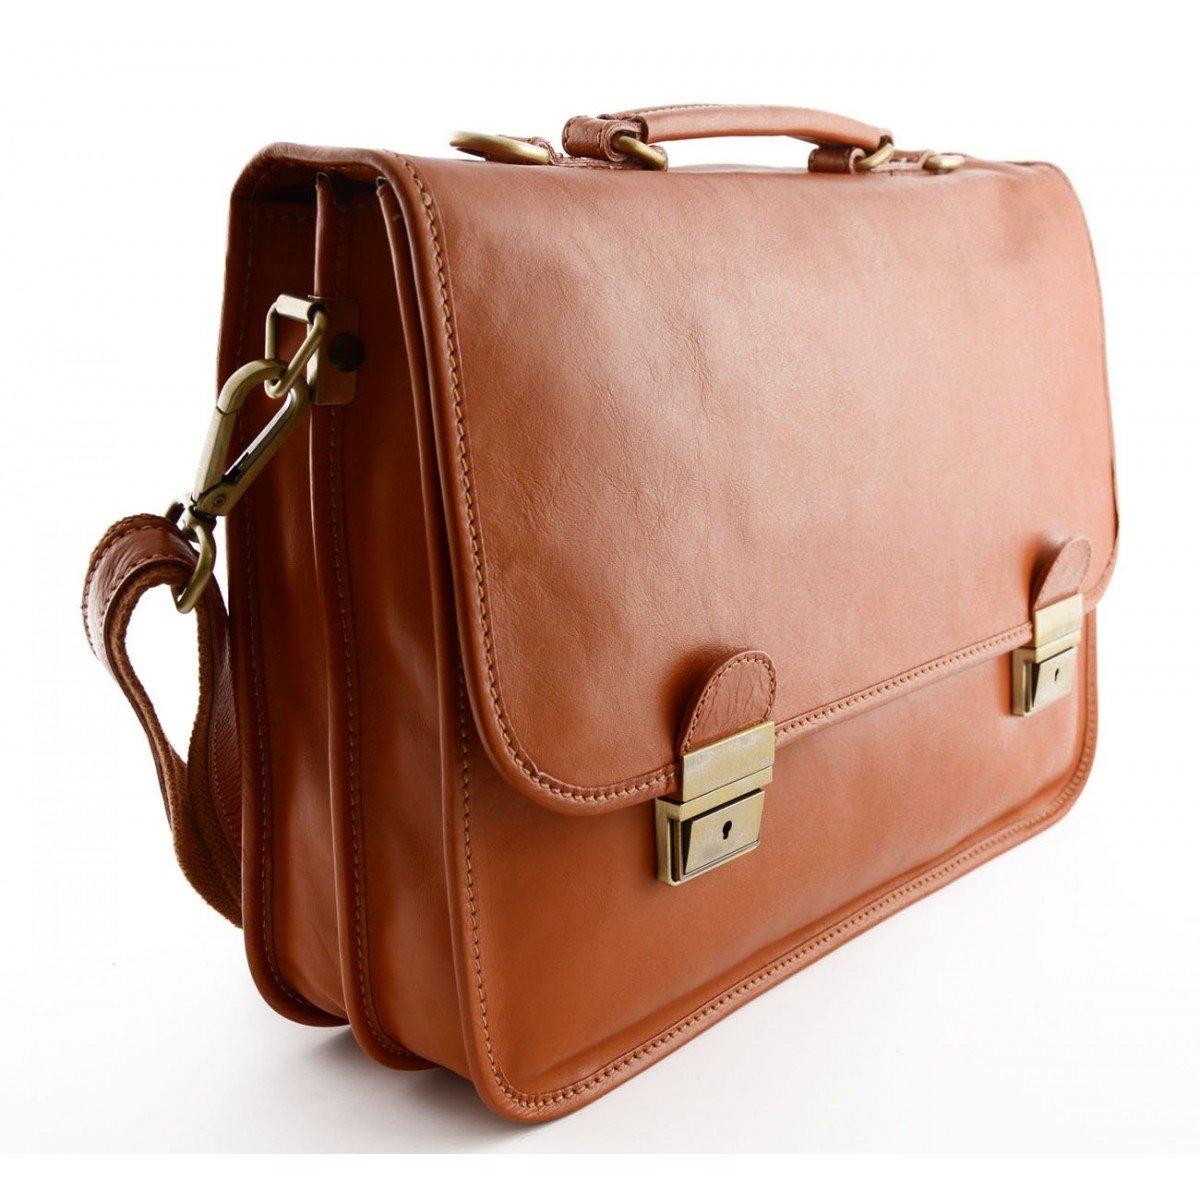 Leather Business Bag Color Honey